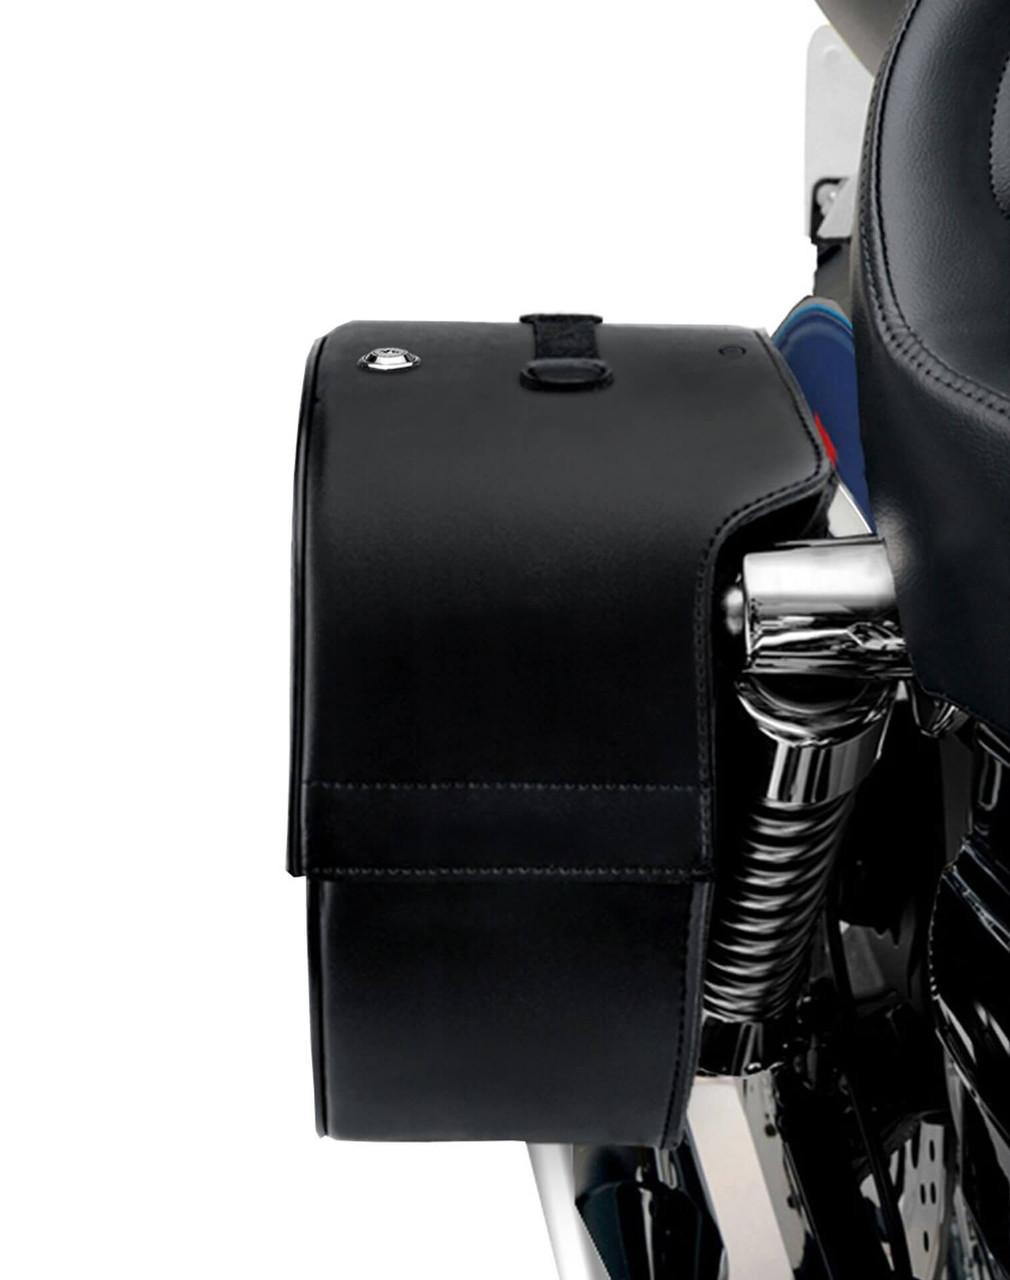 Honda Magna 750 Spear Shock Cutout Motorcycle Saddlebags shock cutout view